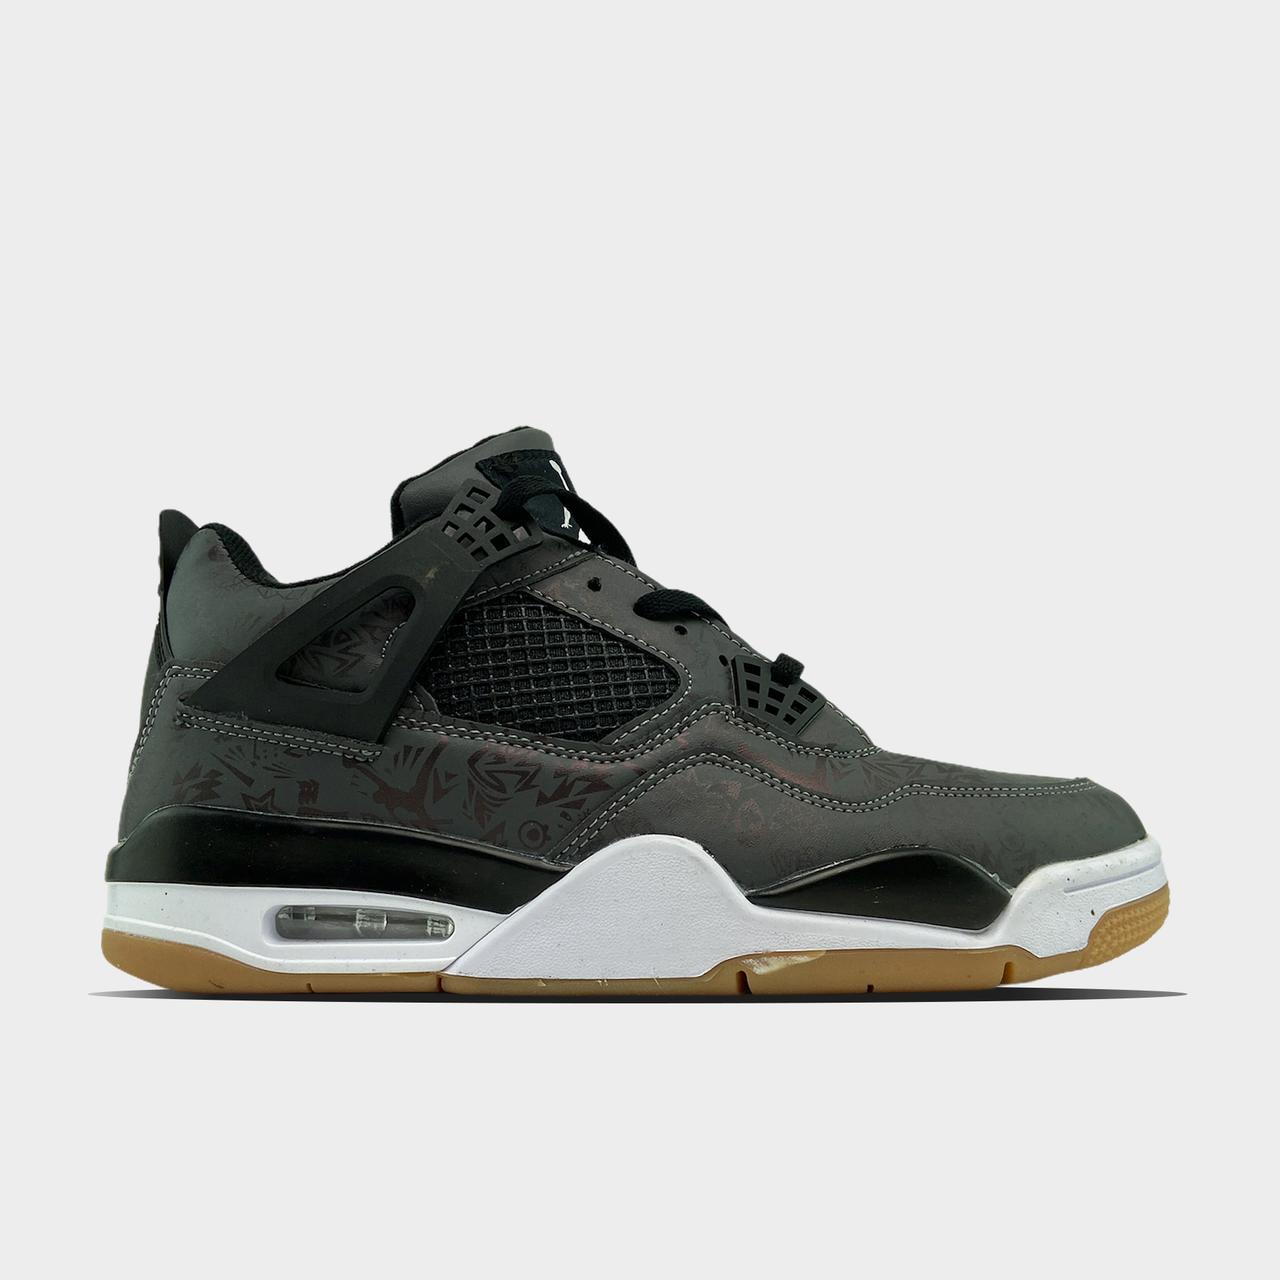 Nike Air Jordan 4 Retro Laser Black Gum (Сірий)